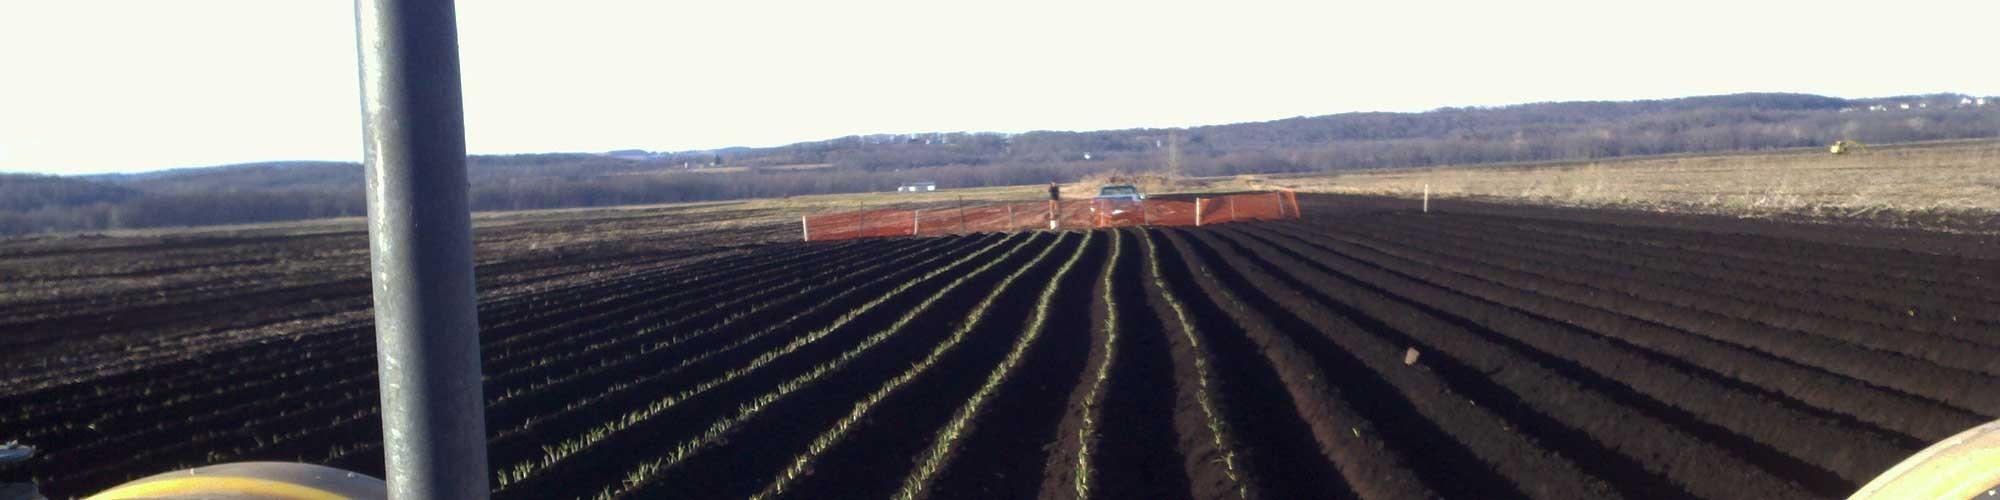 Wholesale Produce & Vegetables - Local & Farm Fresh